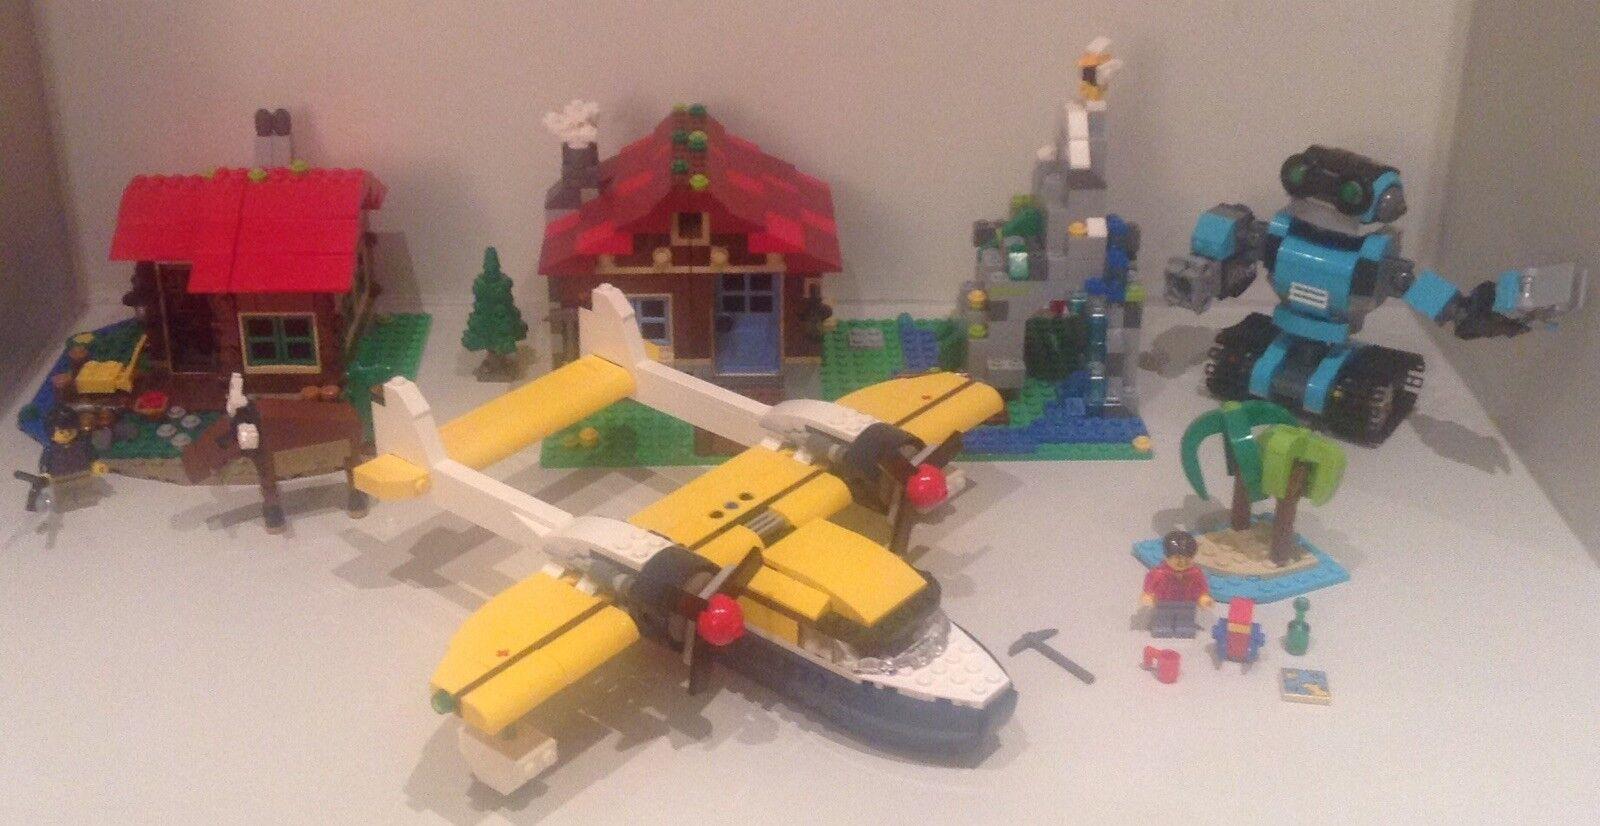 Lego Creator 3 in 1 bundle Lakeside Lodge Mountain Hut Island Robo Explorer